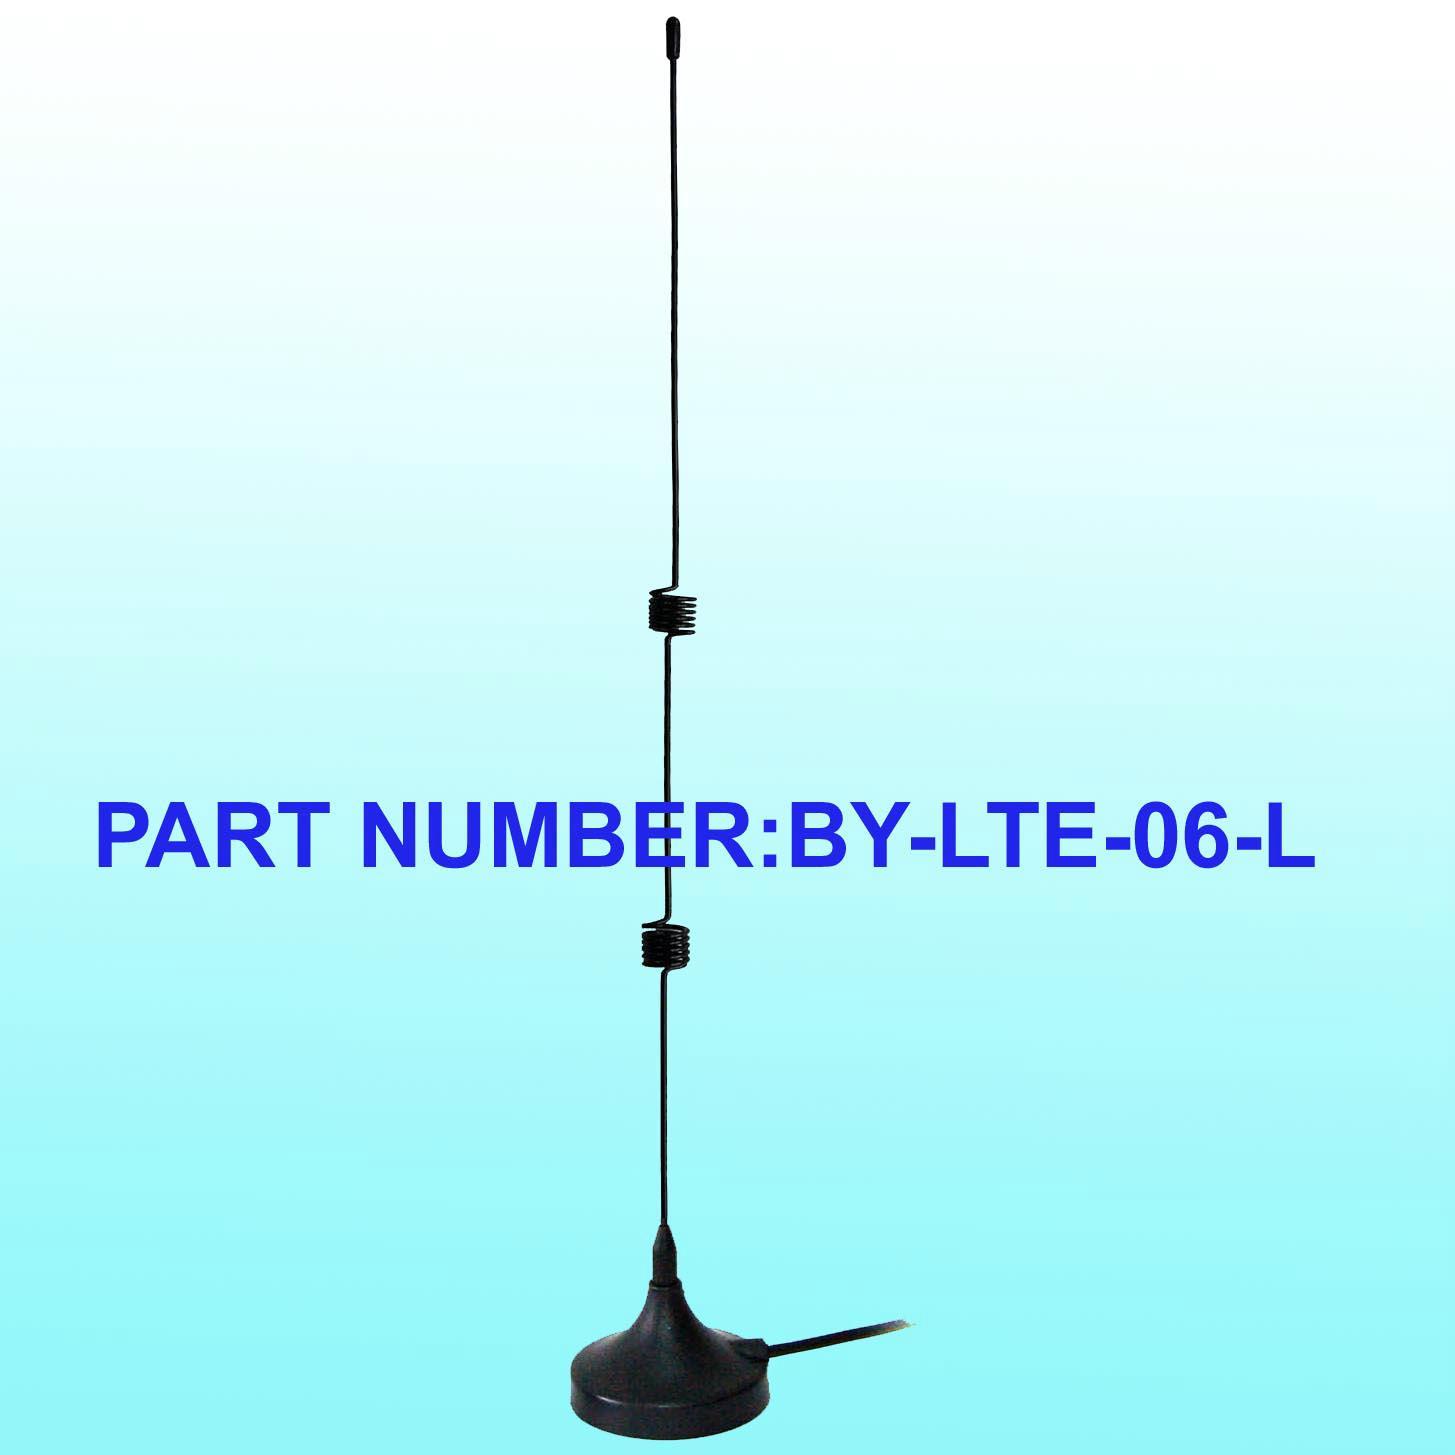 High Gain 7dBi 4G Antenna External 4G Lte Antenna with Stable Signal